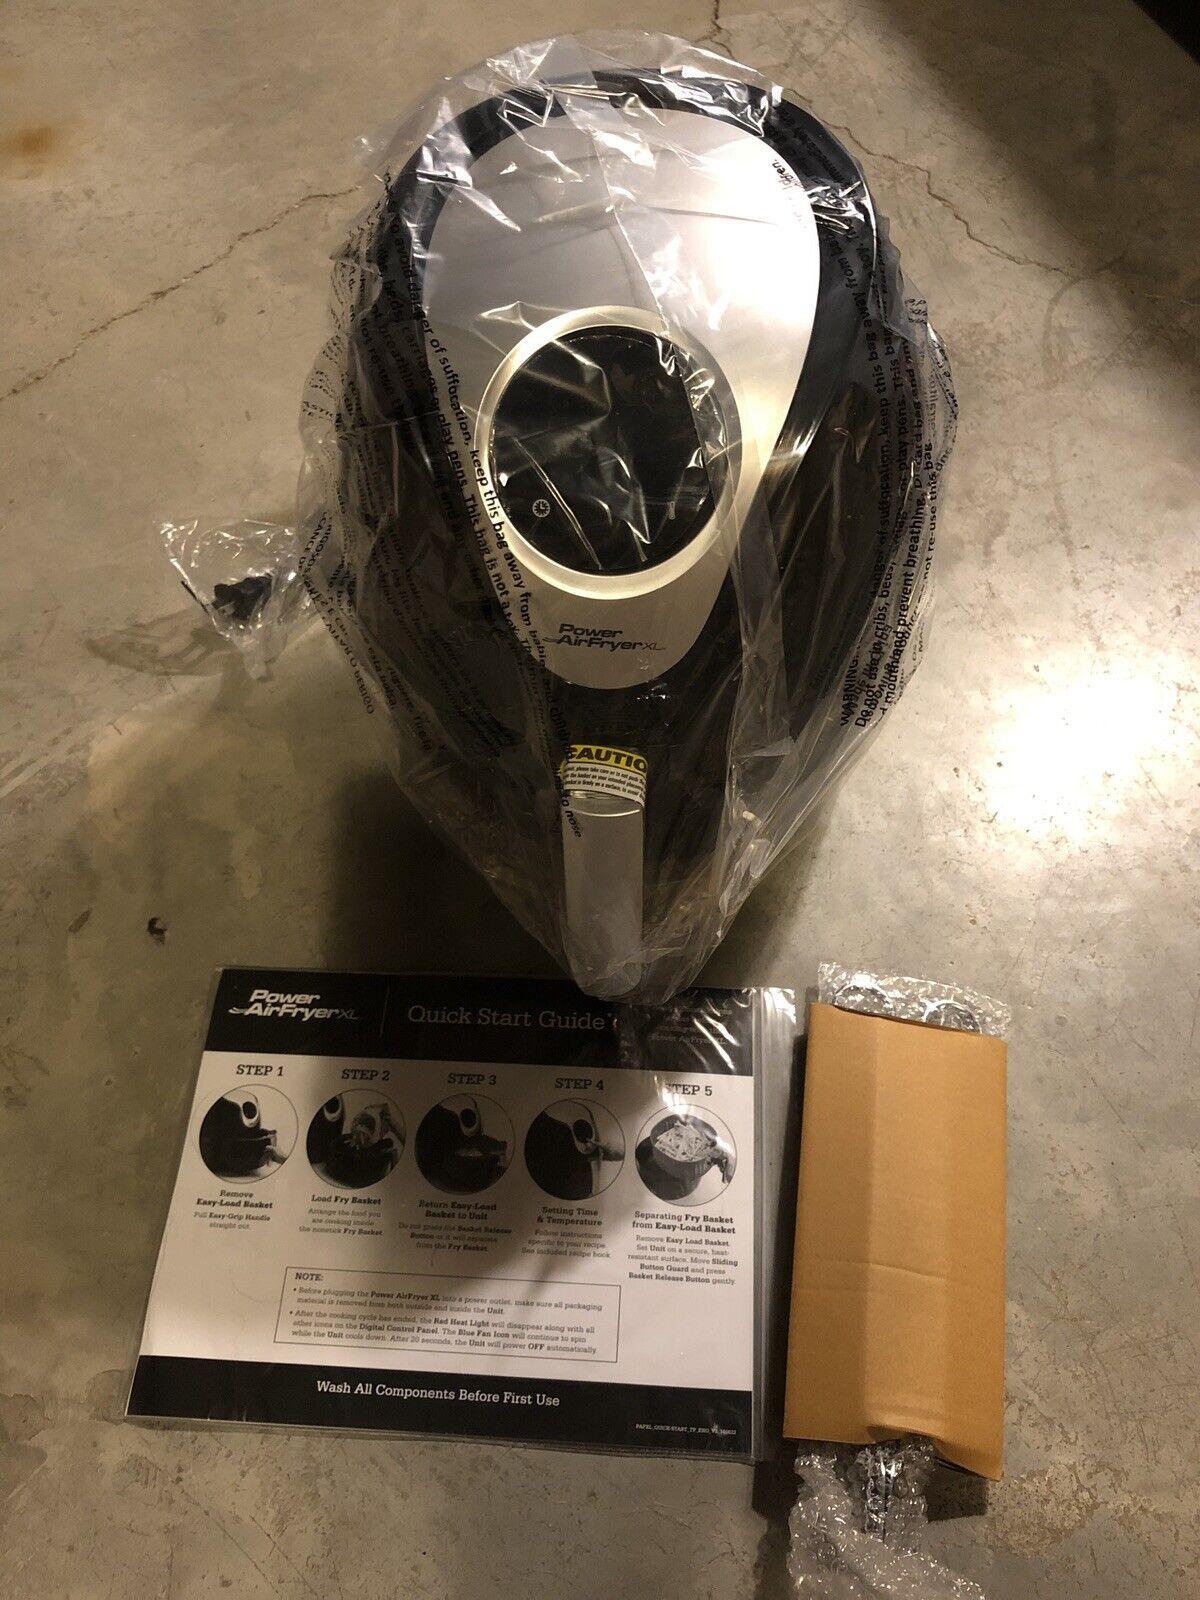 Power AirFryer XL Deluxe 3.4 QT